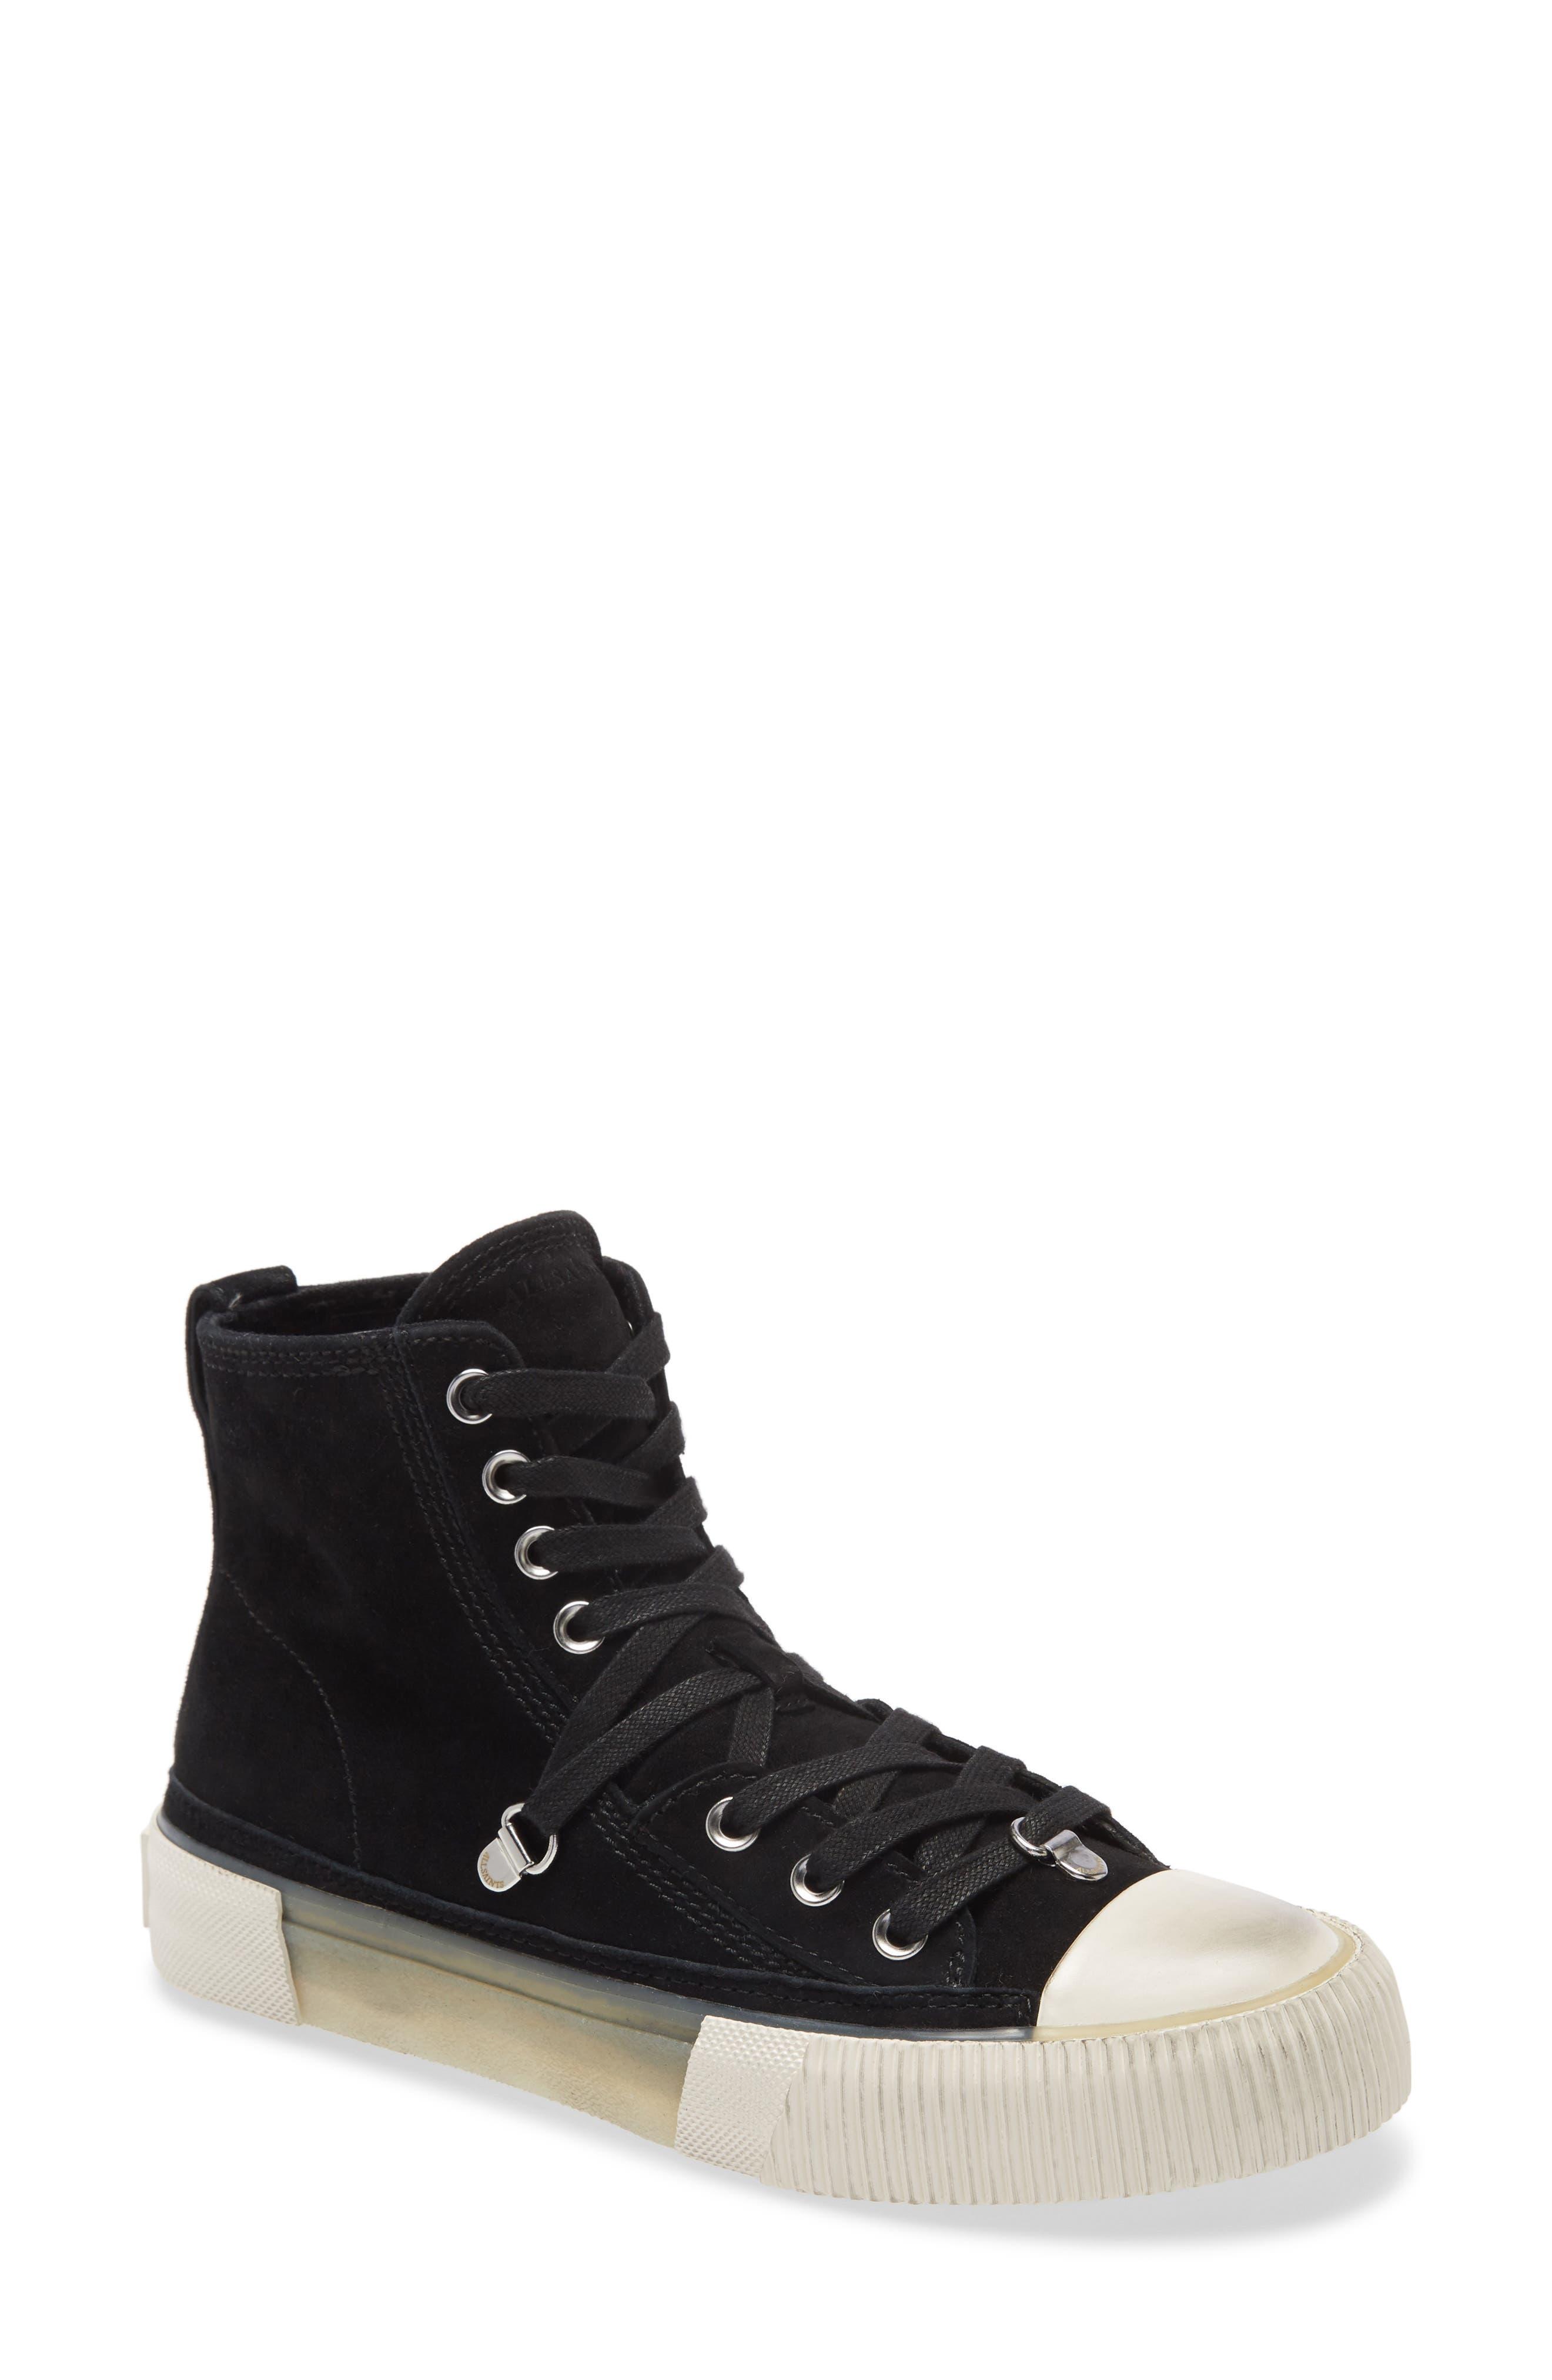 Image of ALLSAINTS Elena High Top Suede Sneaker